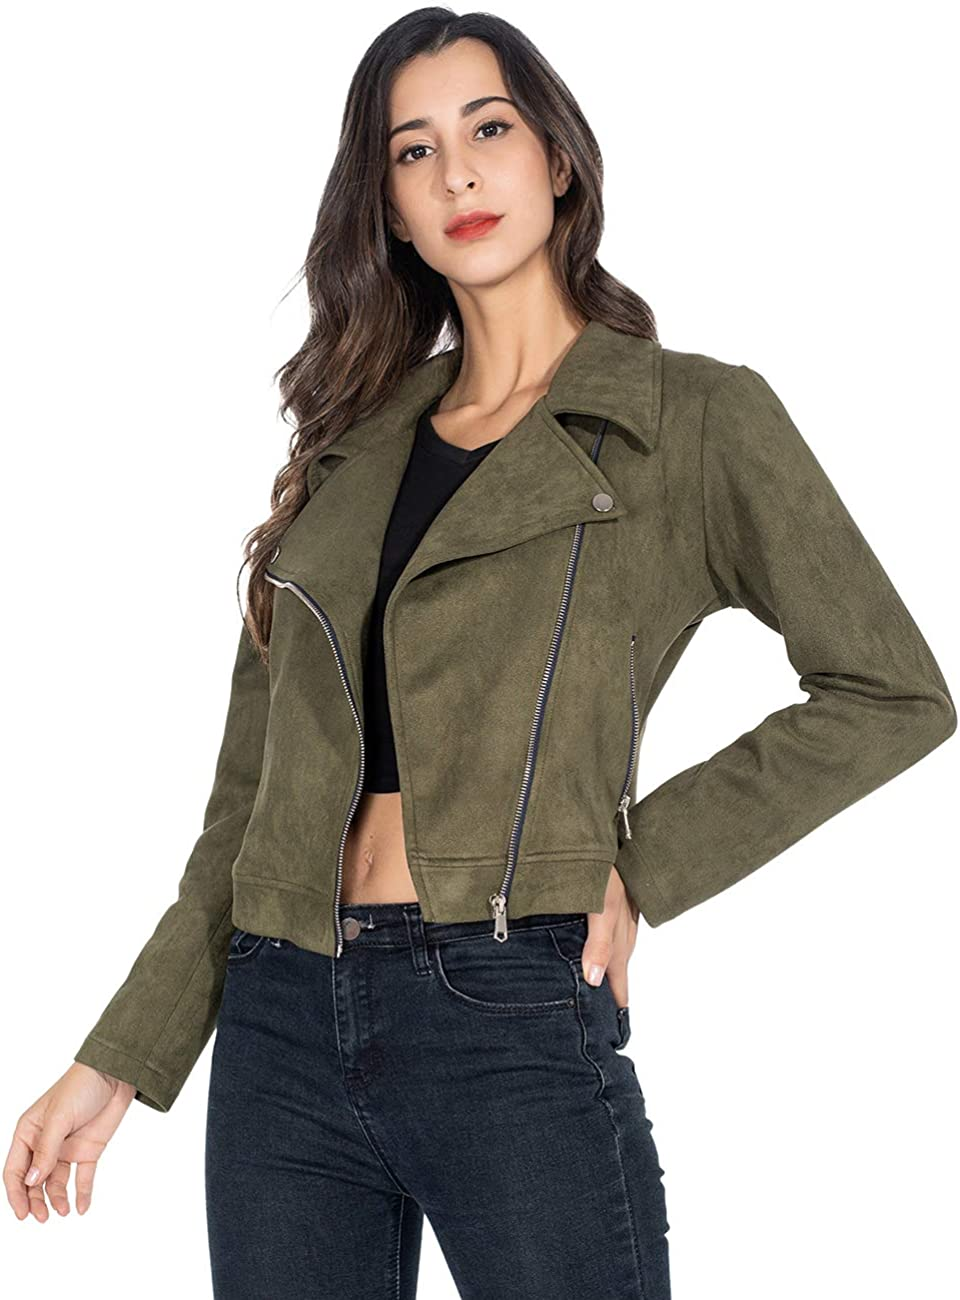 Brovollous Women Faux Suede Jackets Zipper Cropped Jacket Solid Moto Coat